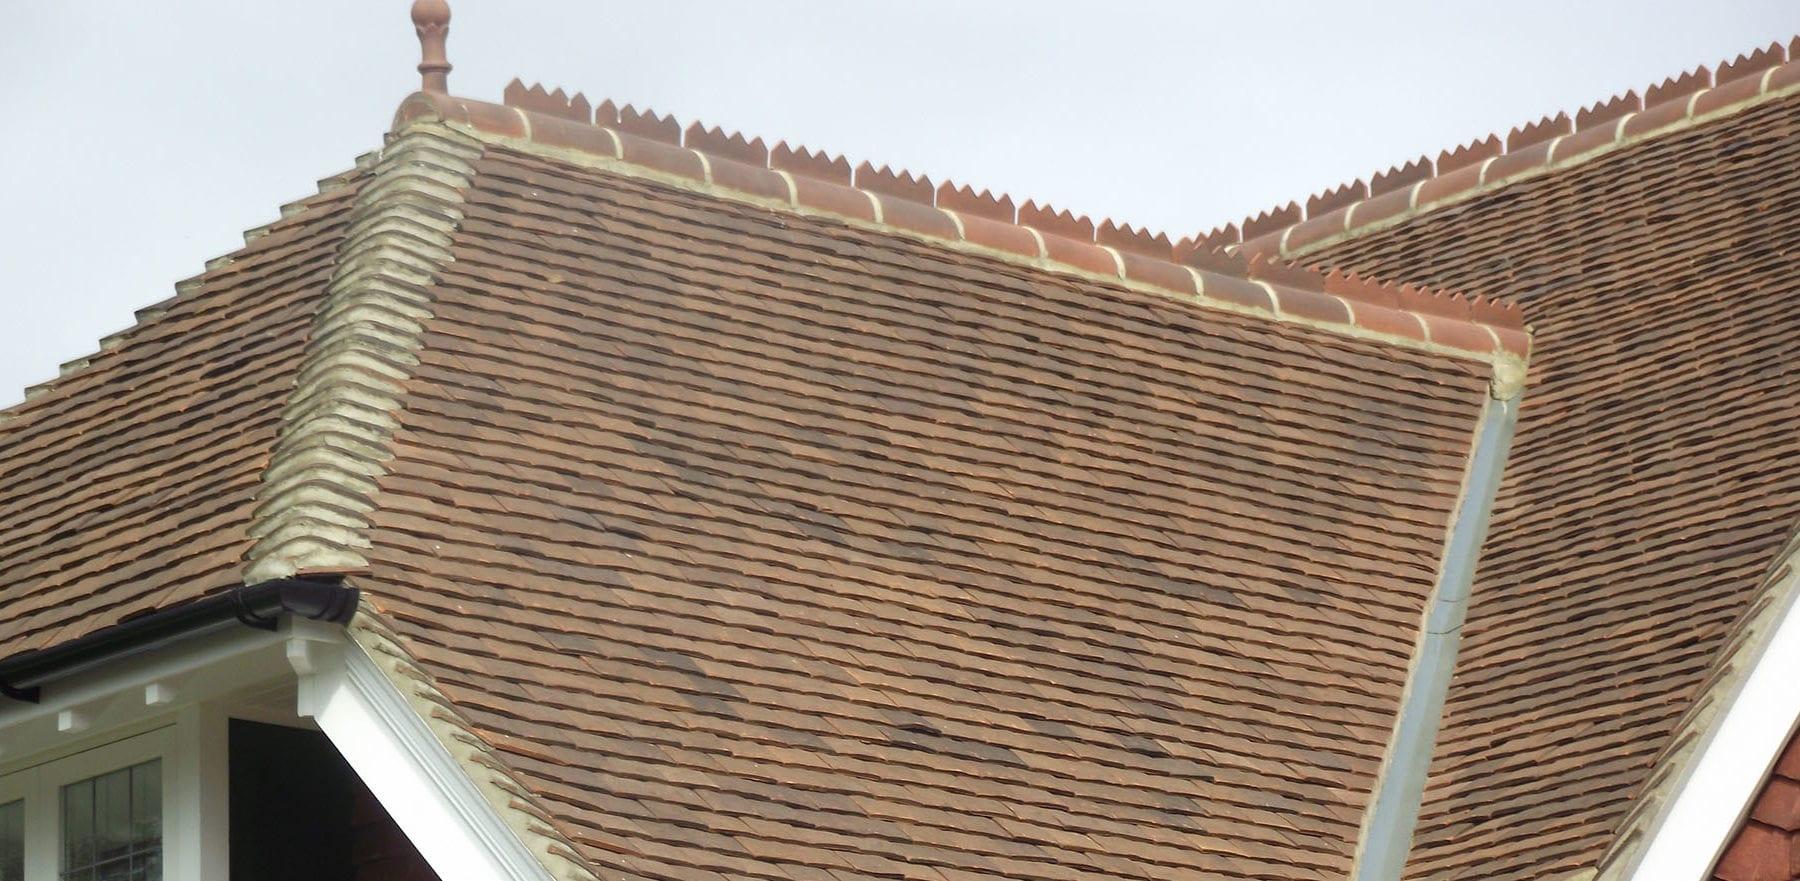 Lifestiles - Handmade Restoration Clay Roof Tiles - Cranleigh, England 5